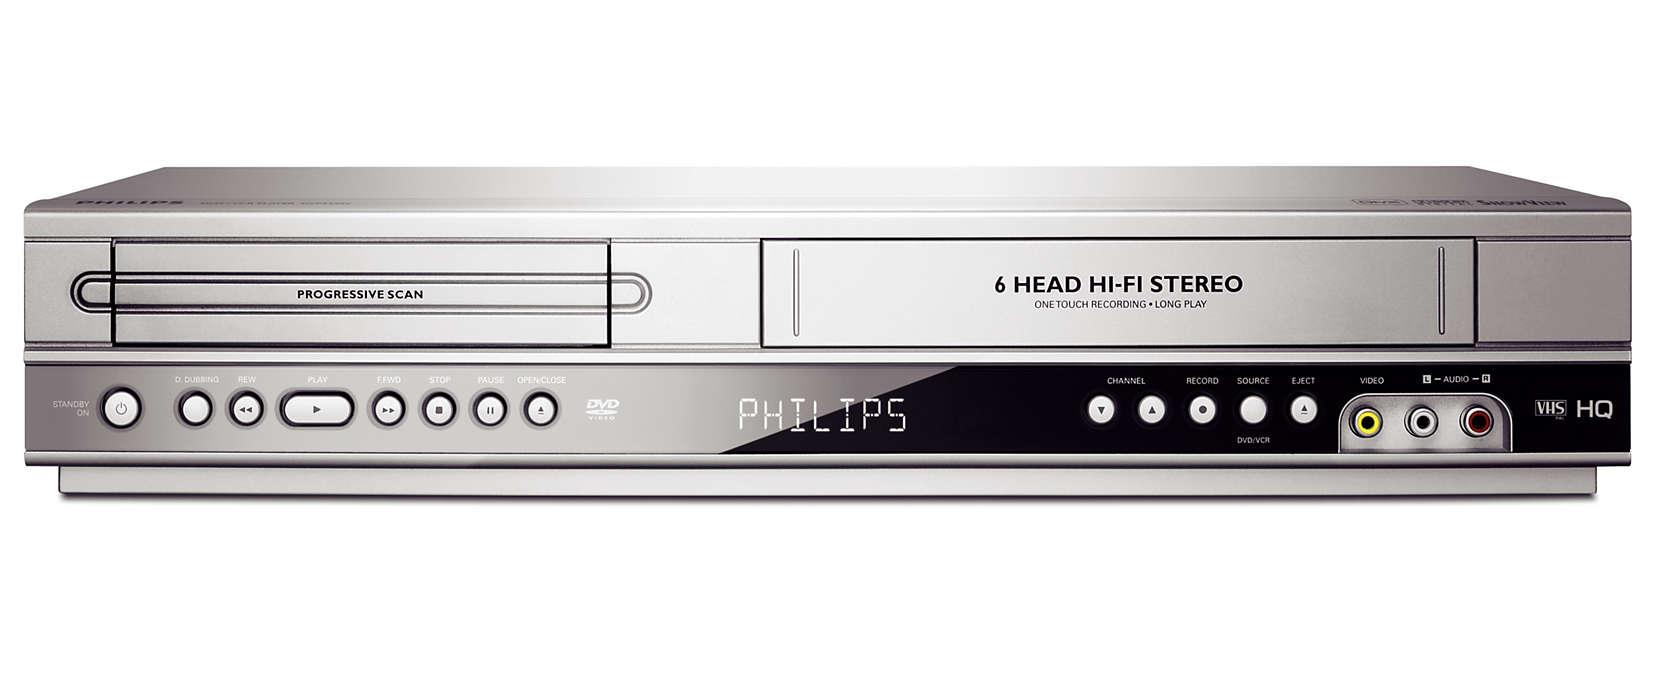 Riproduce DVD e videocassette